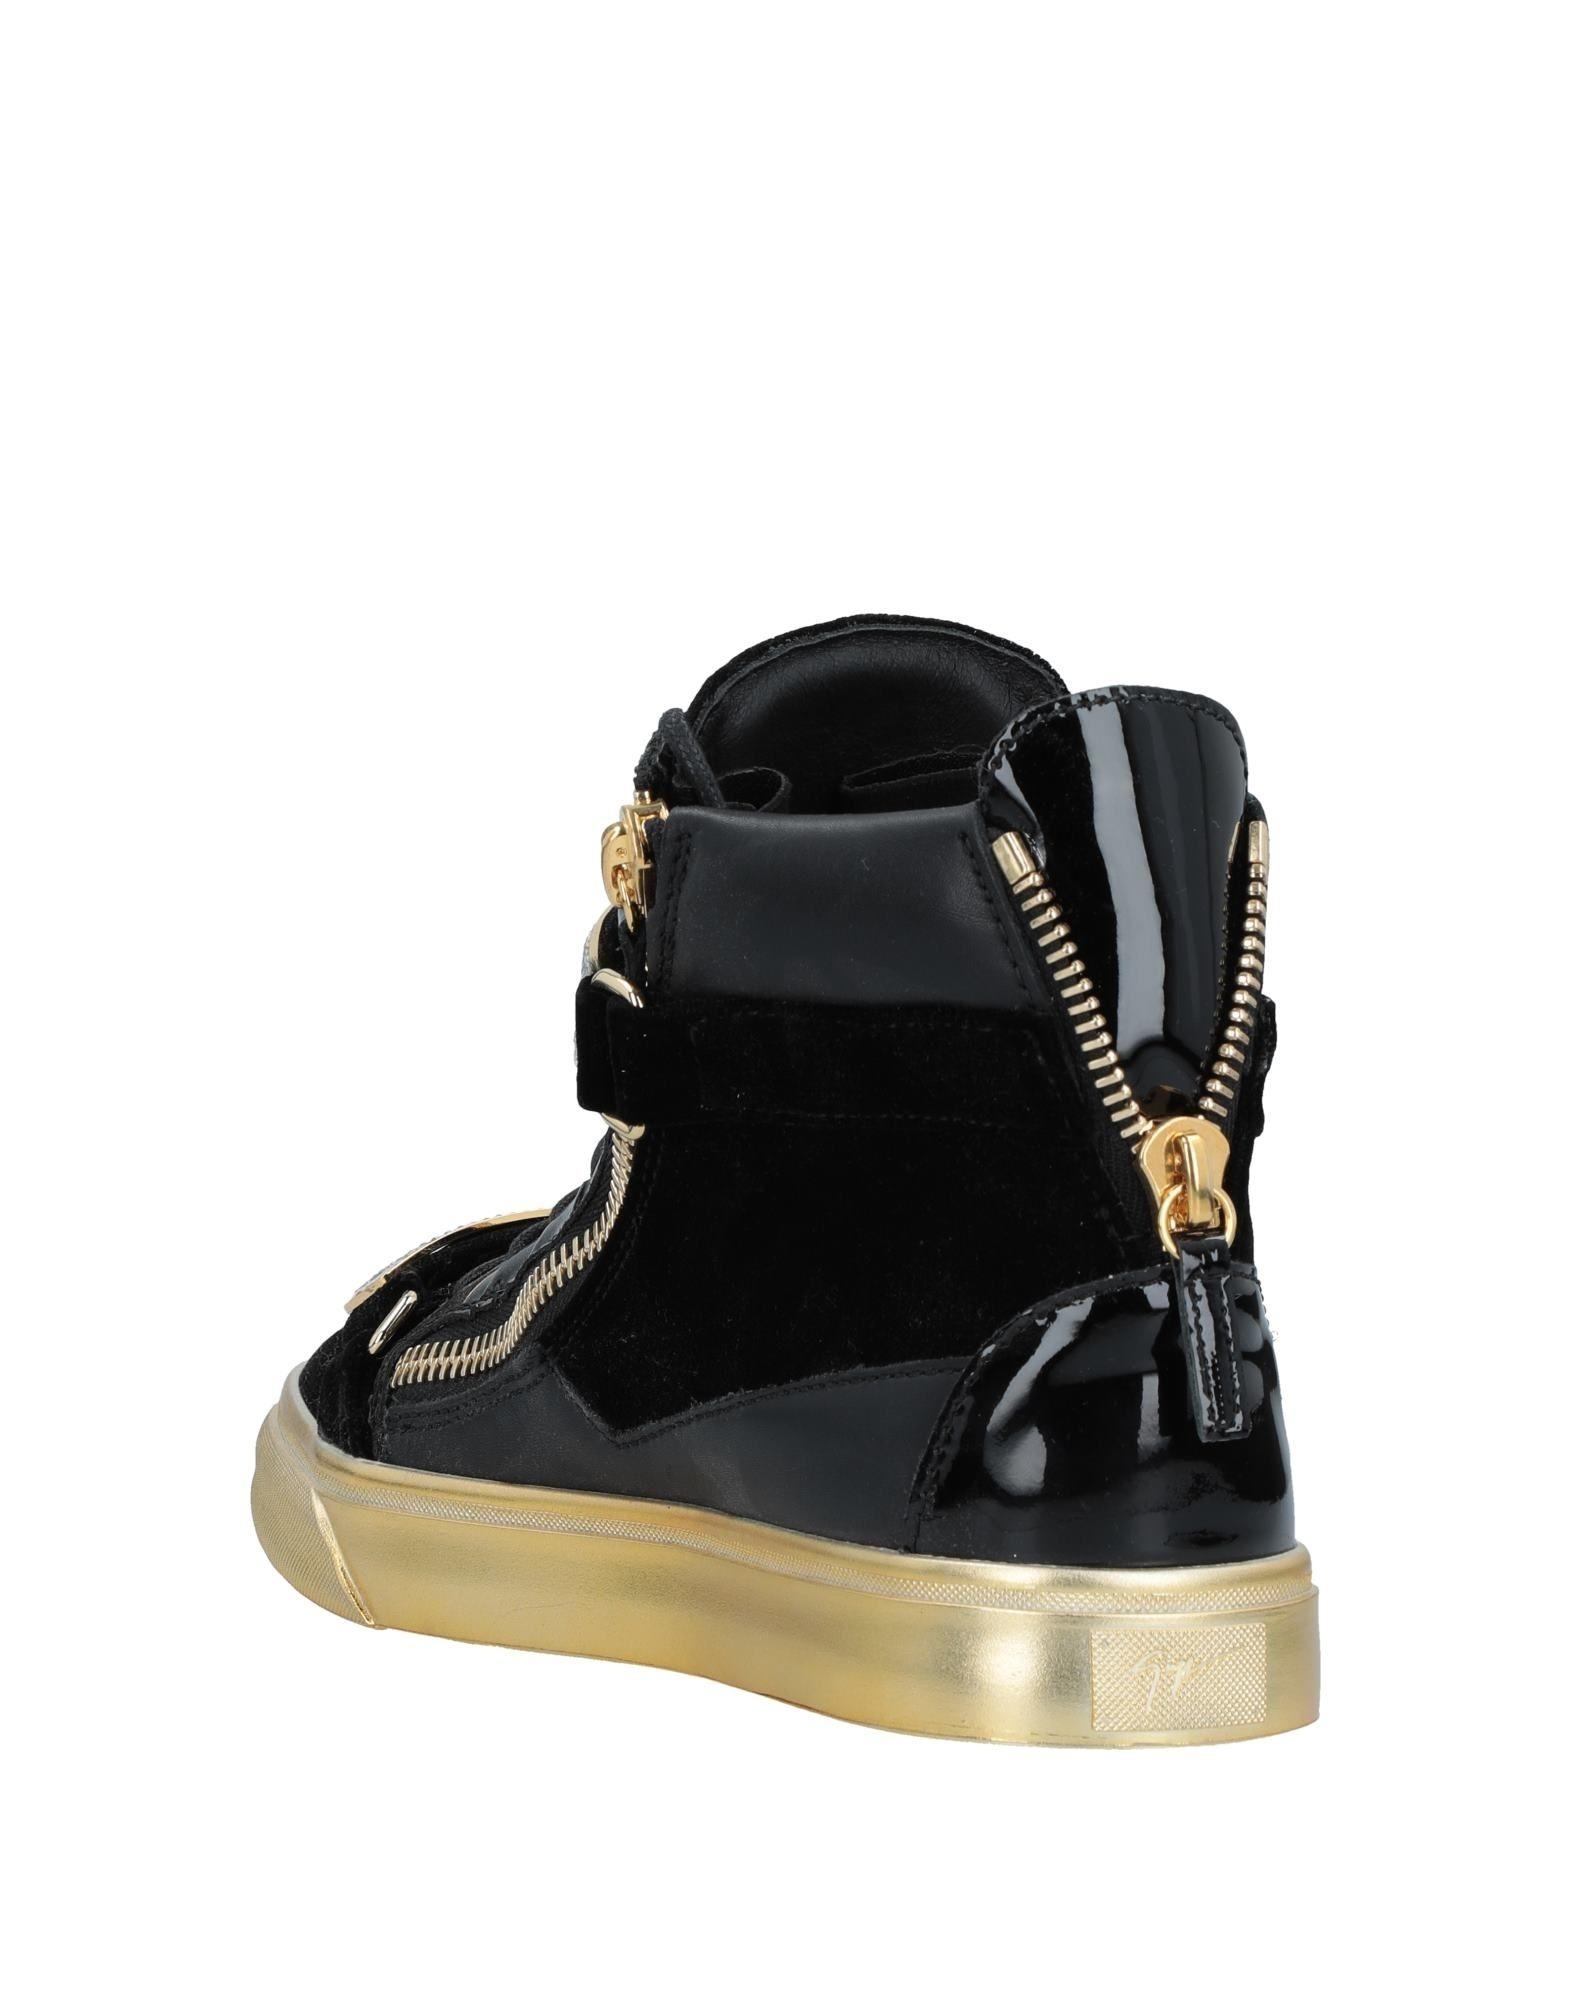 Giuseppe Zanotti  Sneakers Damen  Zanotti 11495687NA Beliebte Schuhe 83f573